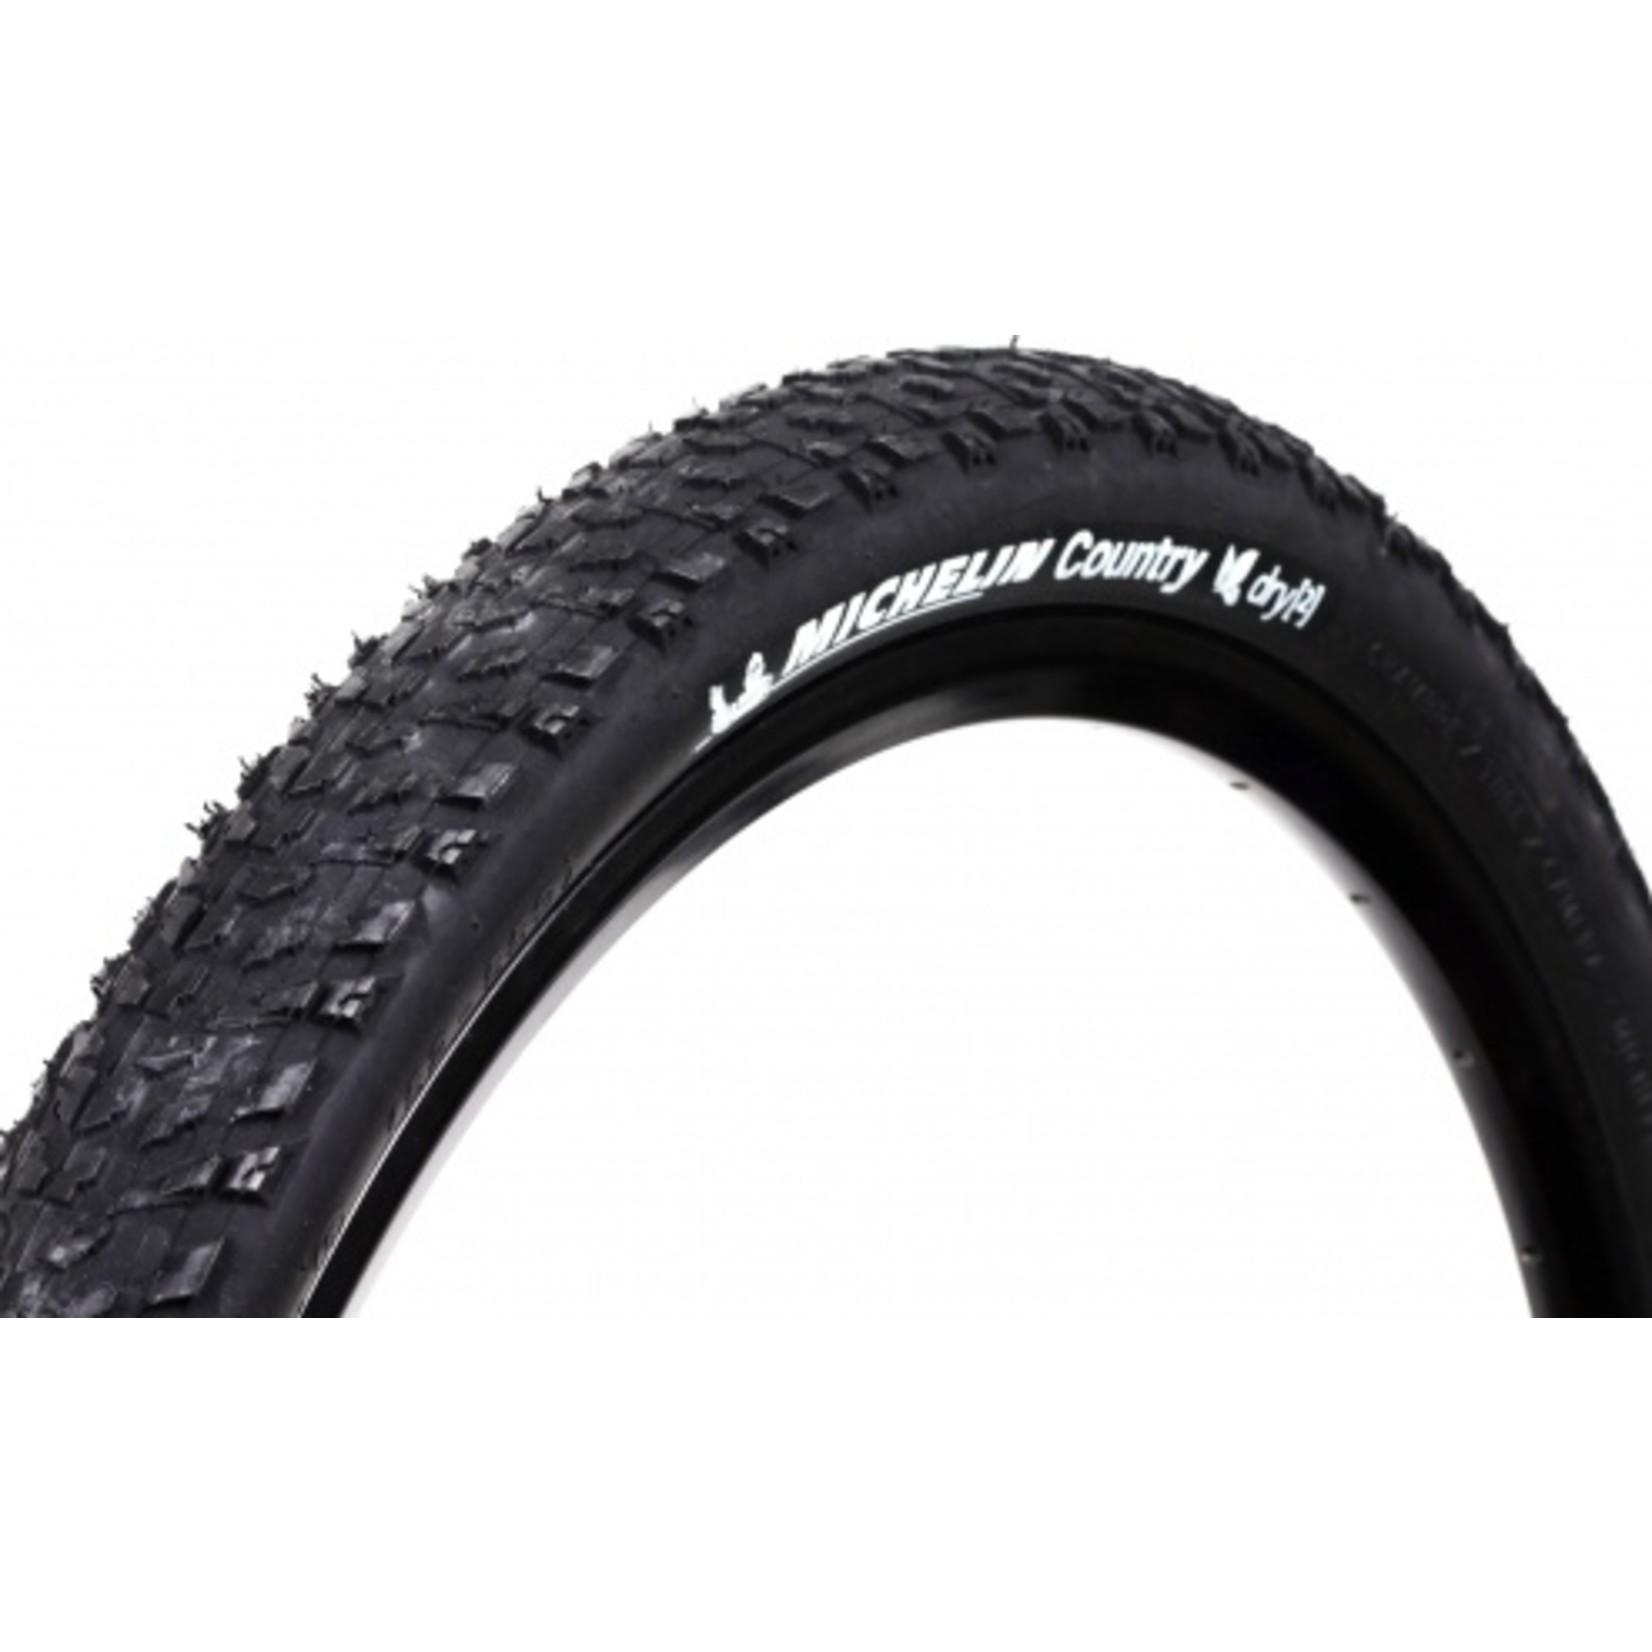 Michelin Michelin Country Dry 2 Tire, 26x2.00